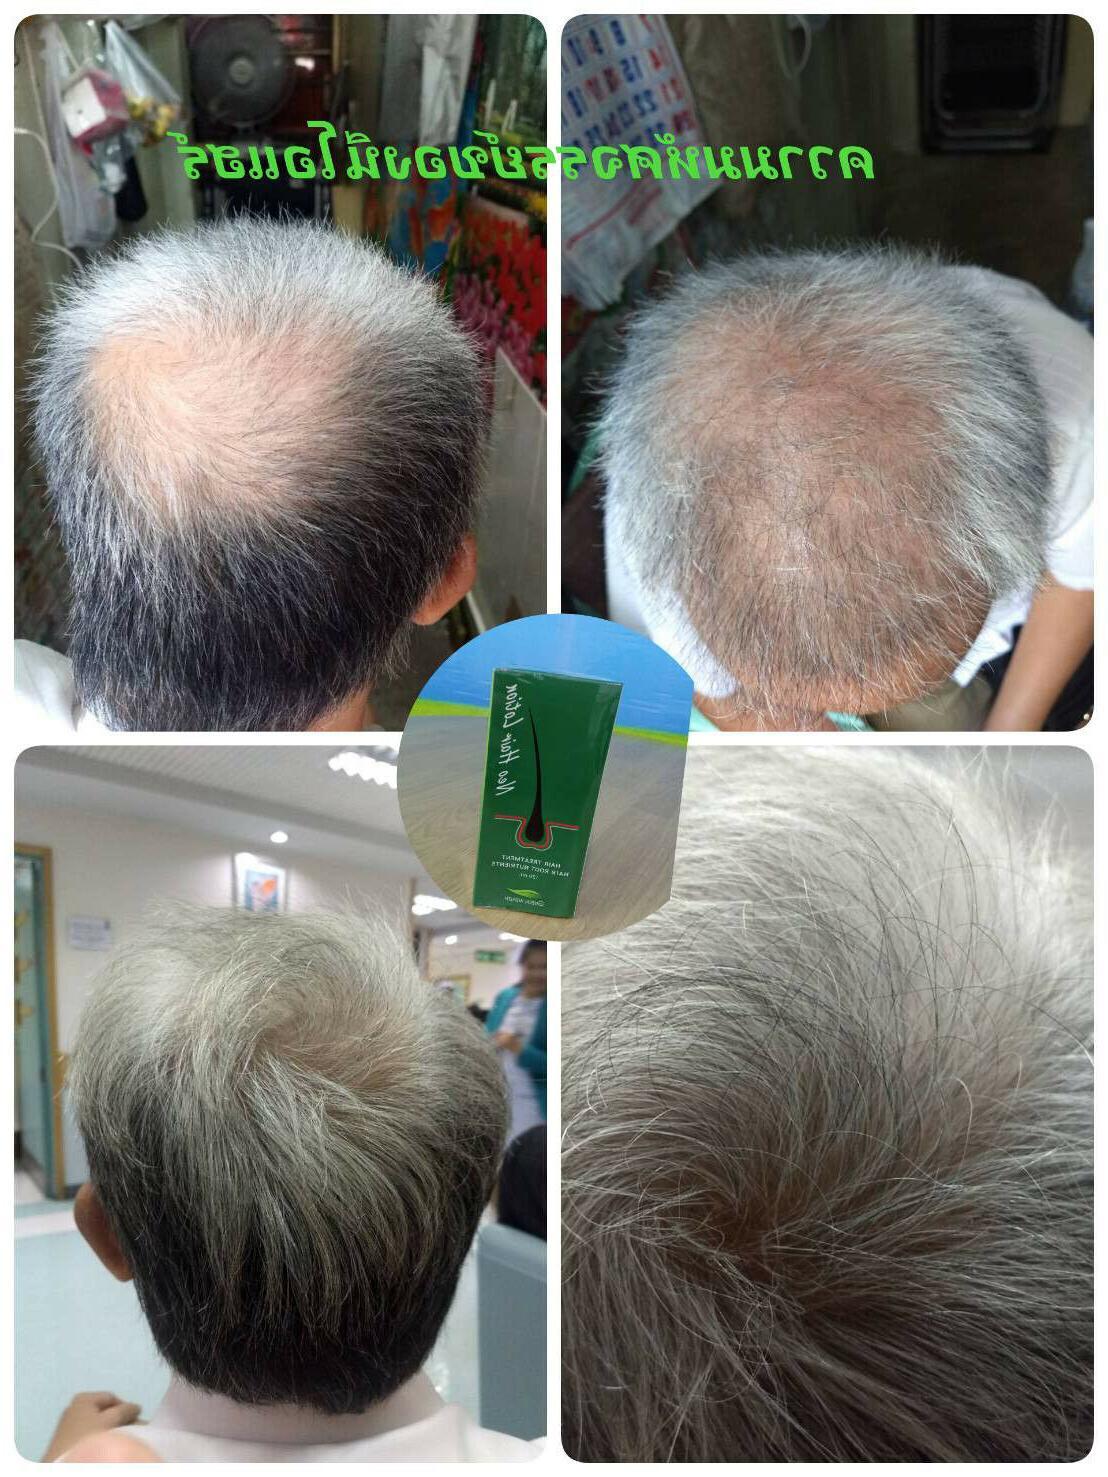 NEO Lotion BEARD SIDEBURNS Longer Stop Anti Hair Fall